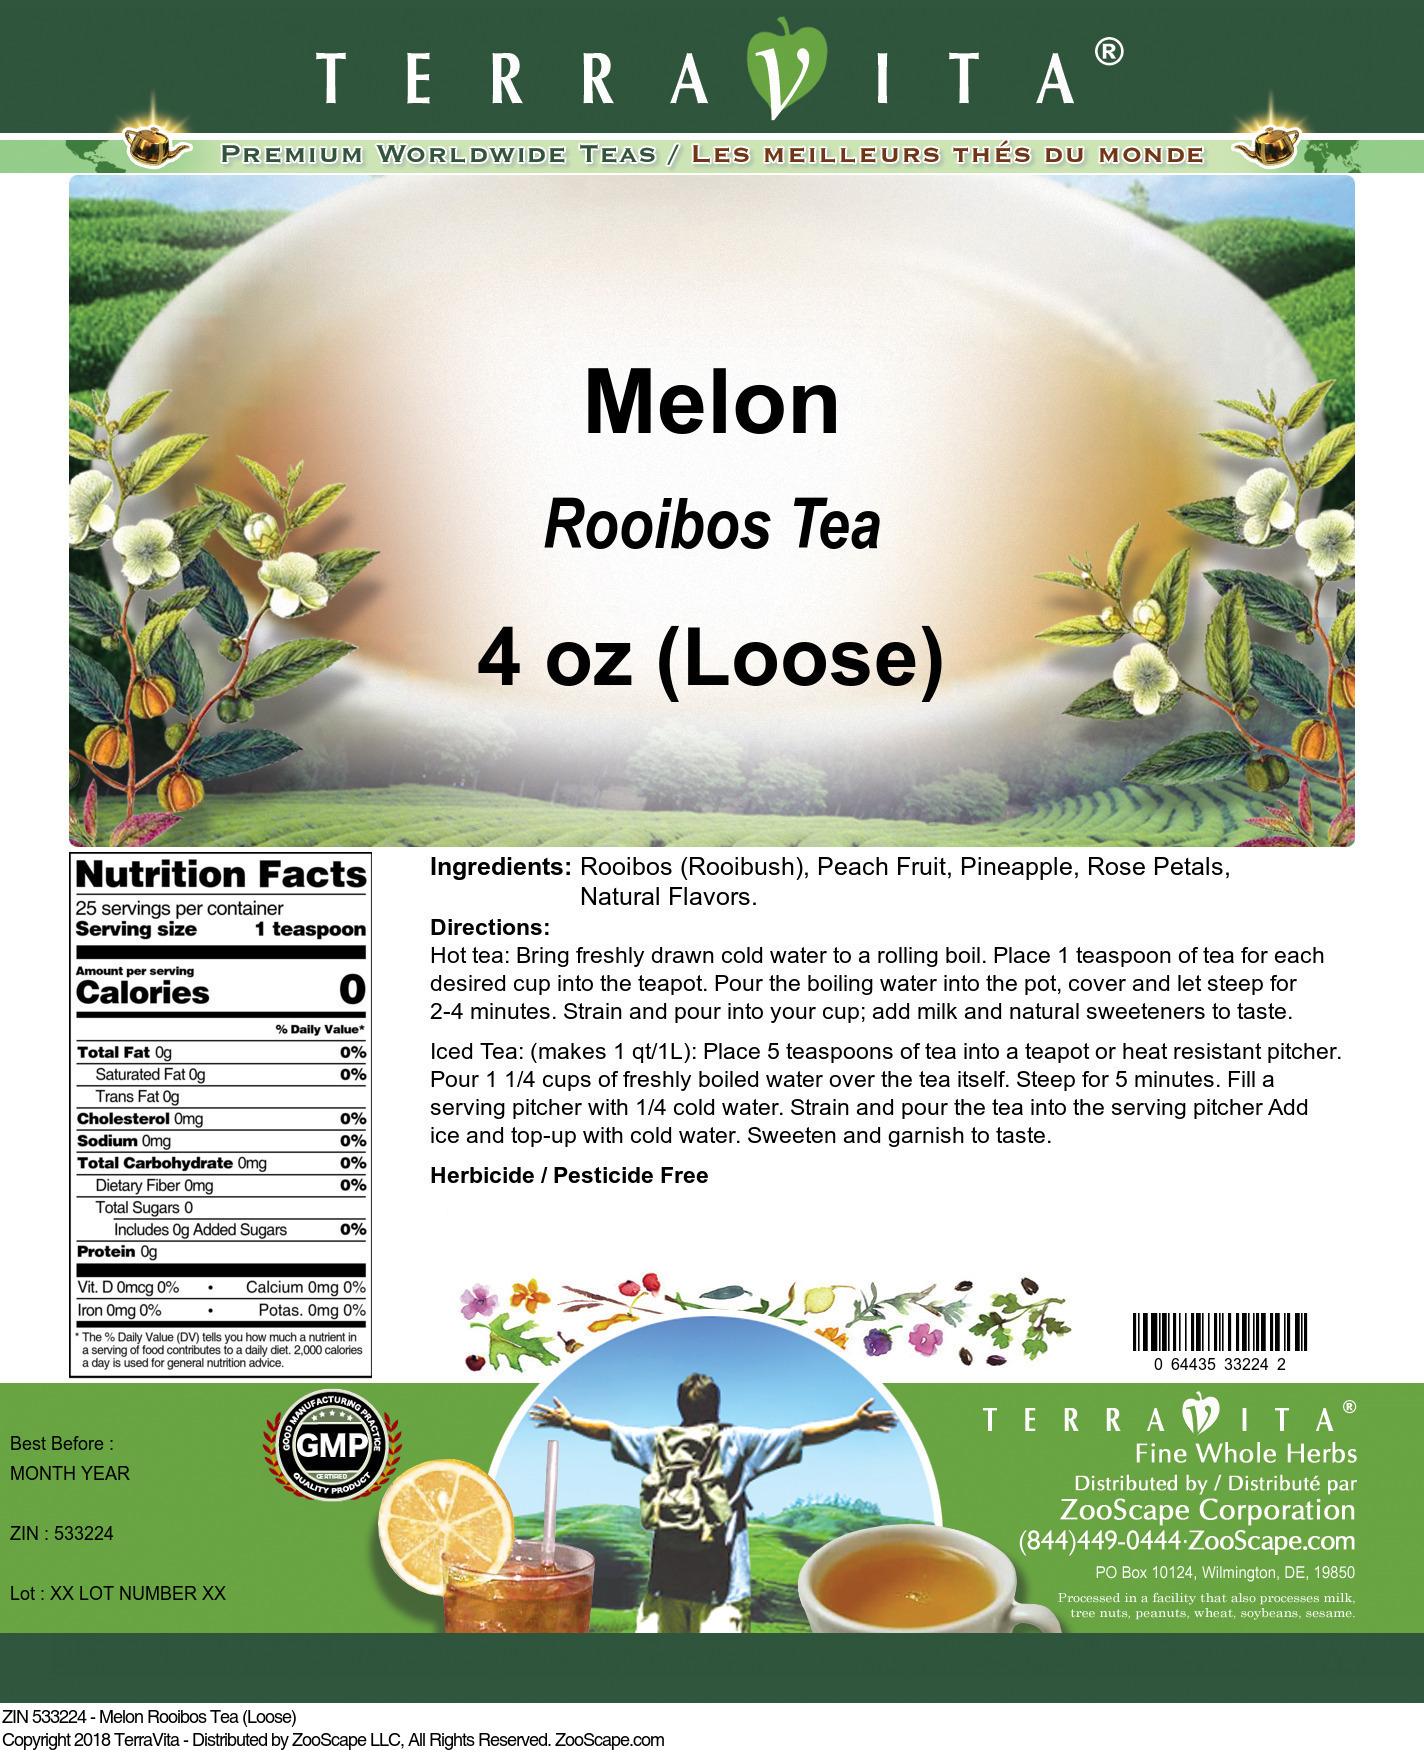 Melon Rooibos Tea (Loose)